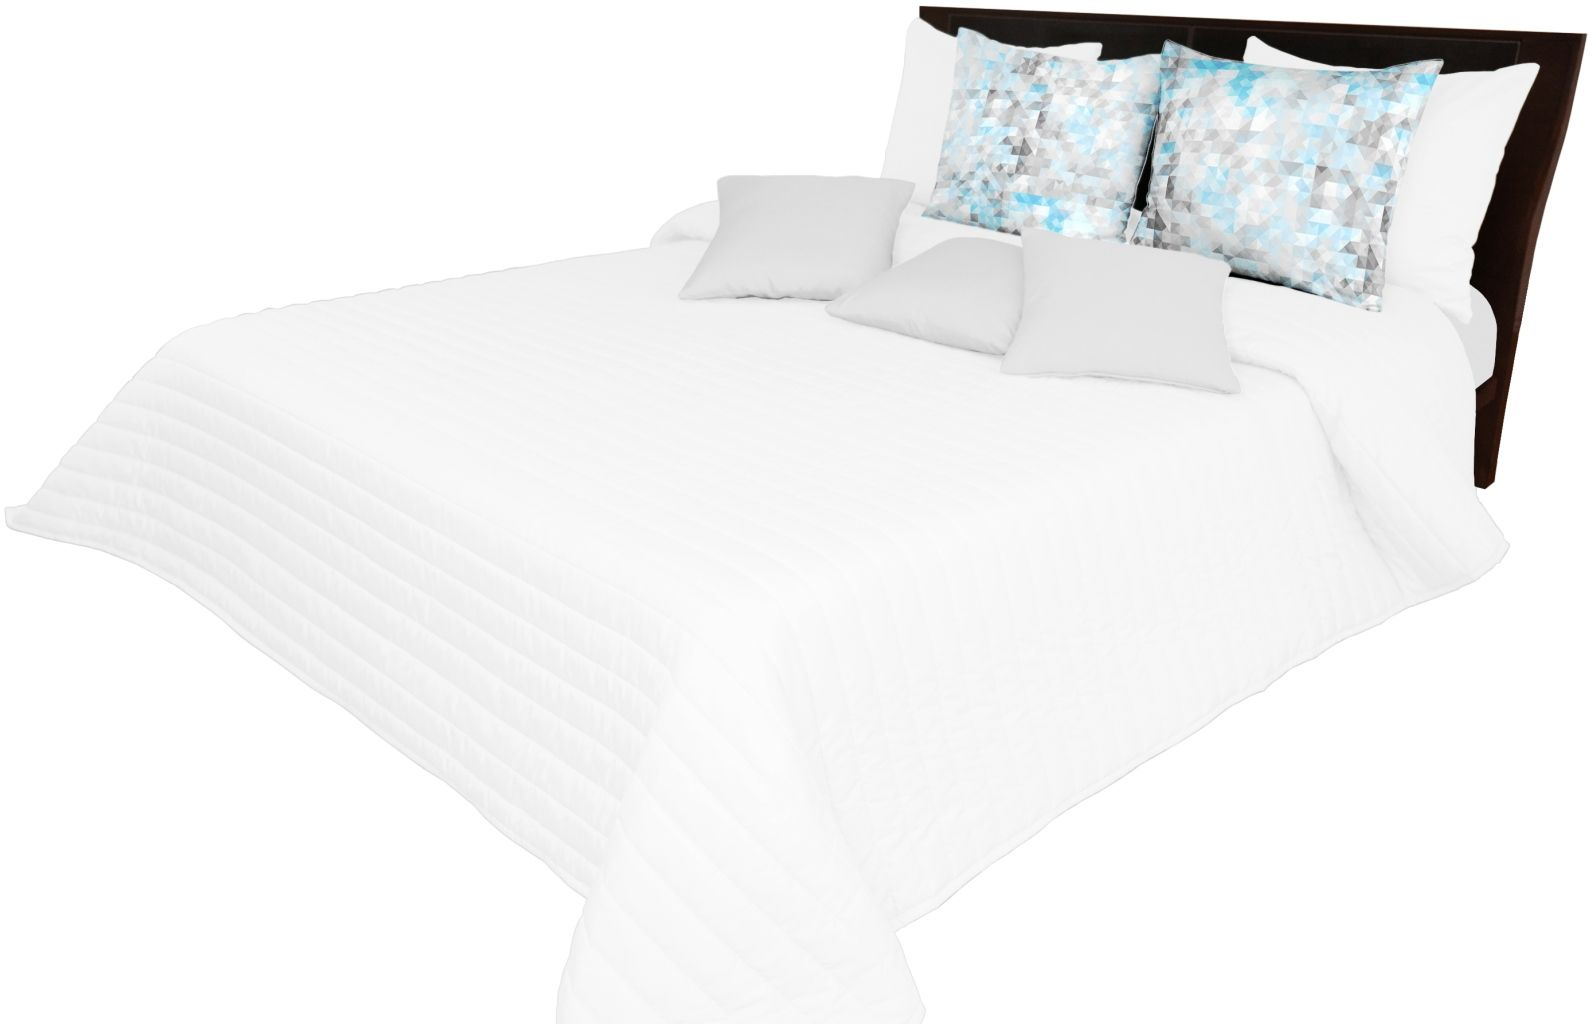 Narzuta pikowana na łóżko NMG-06 Mariall